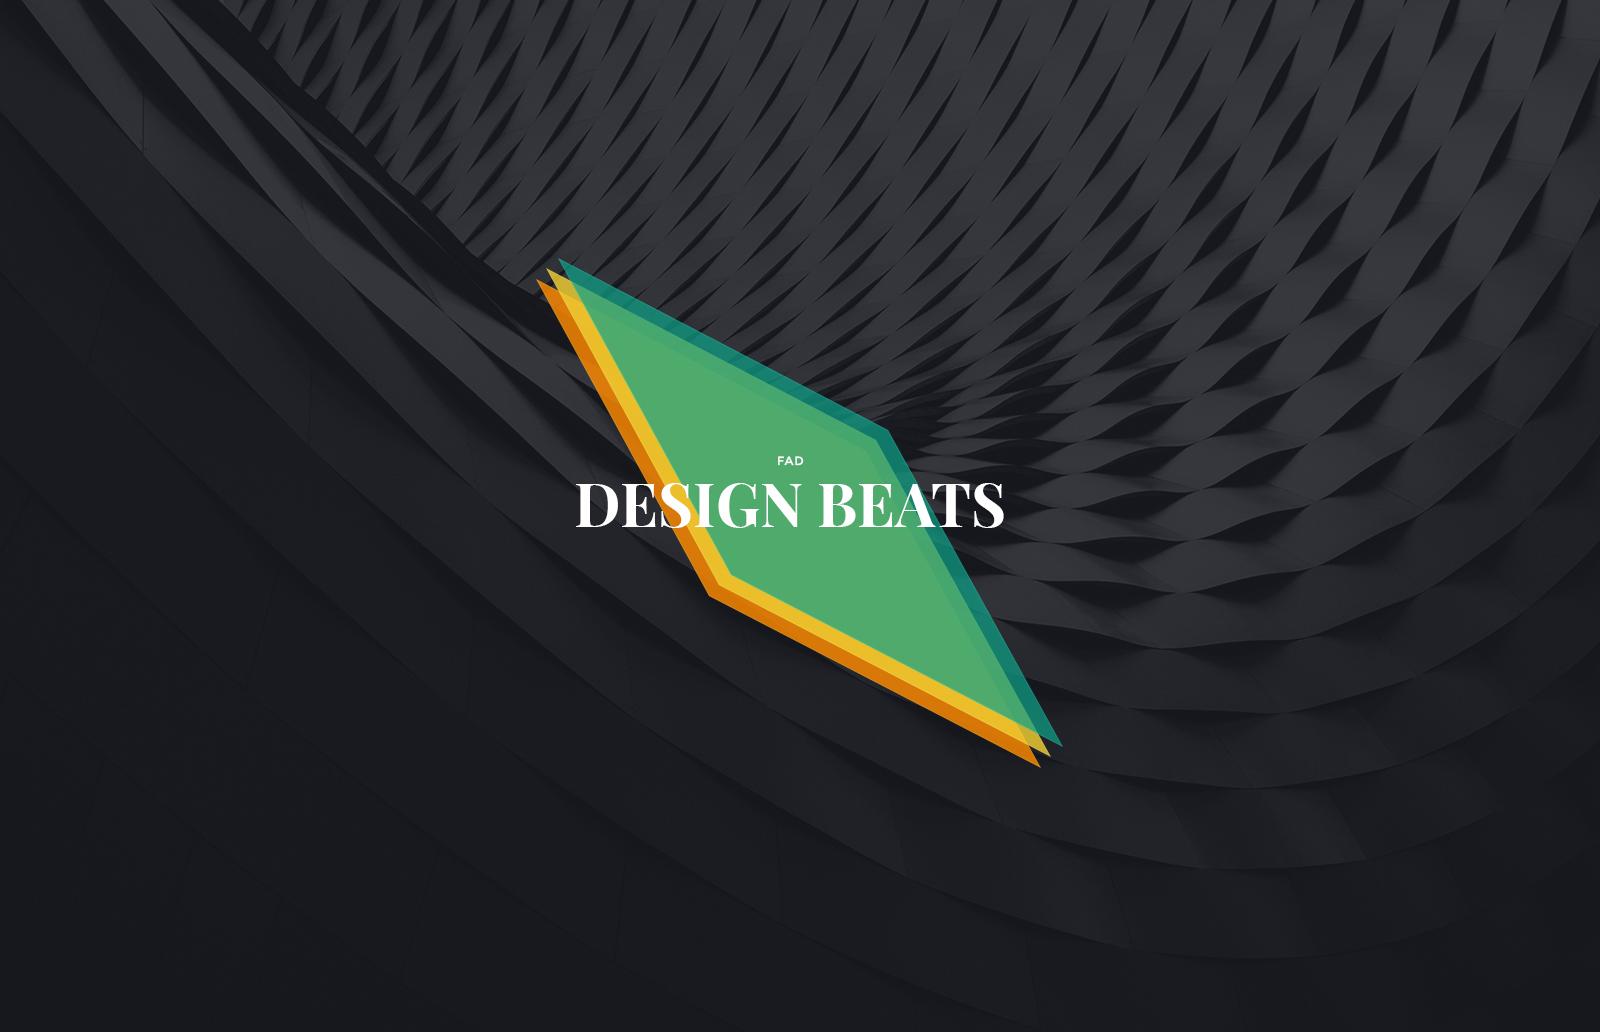 desigbeats_casestudy__01